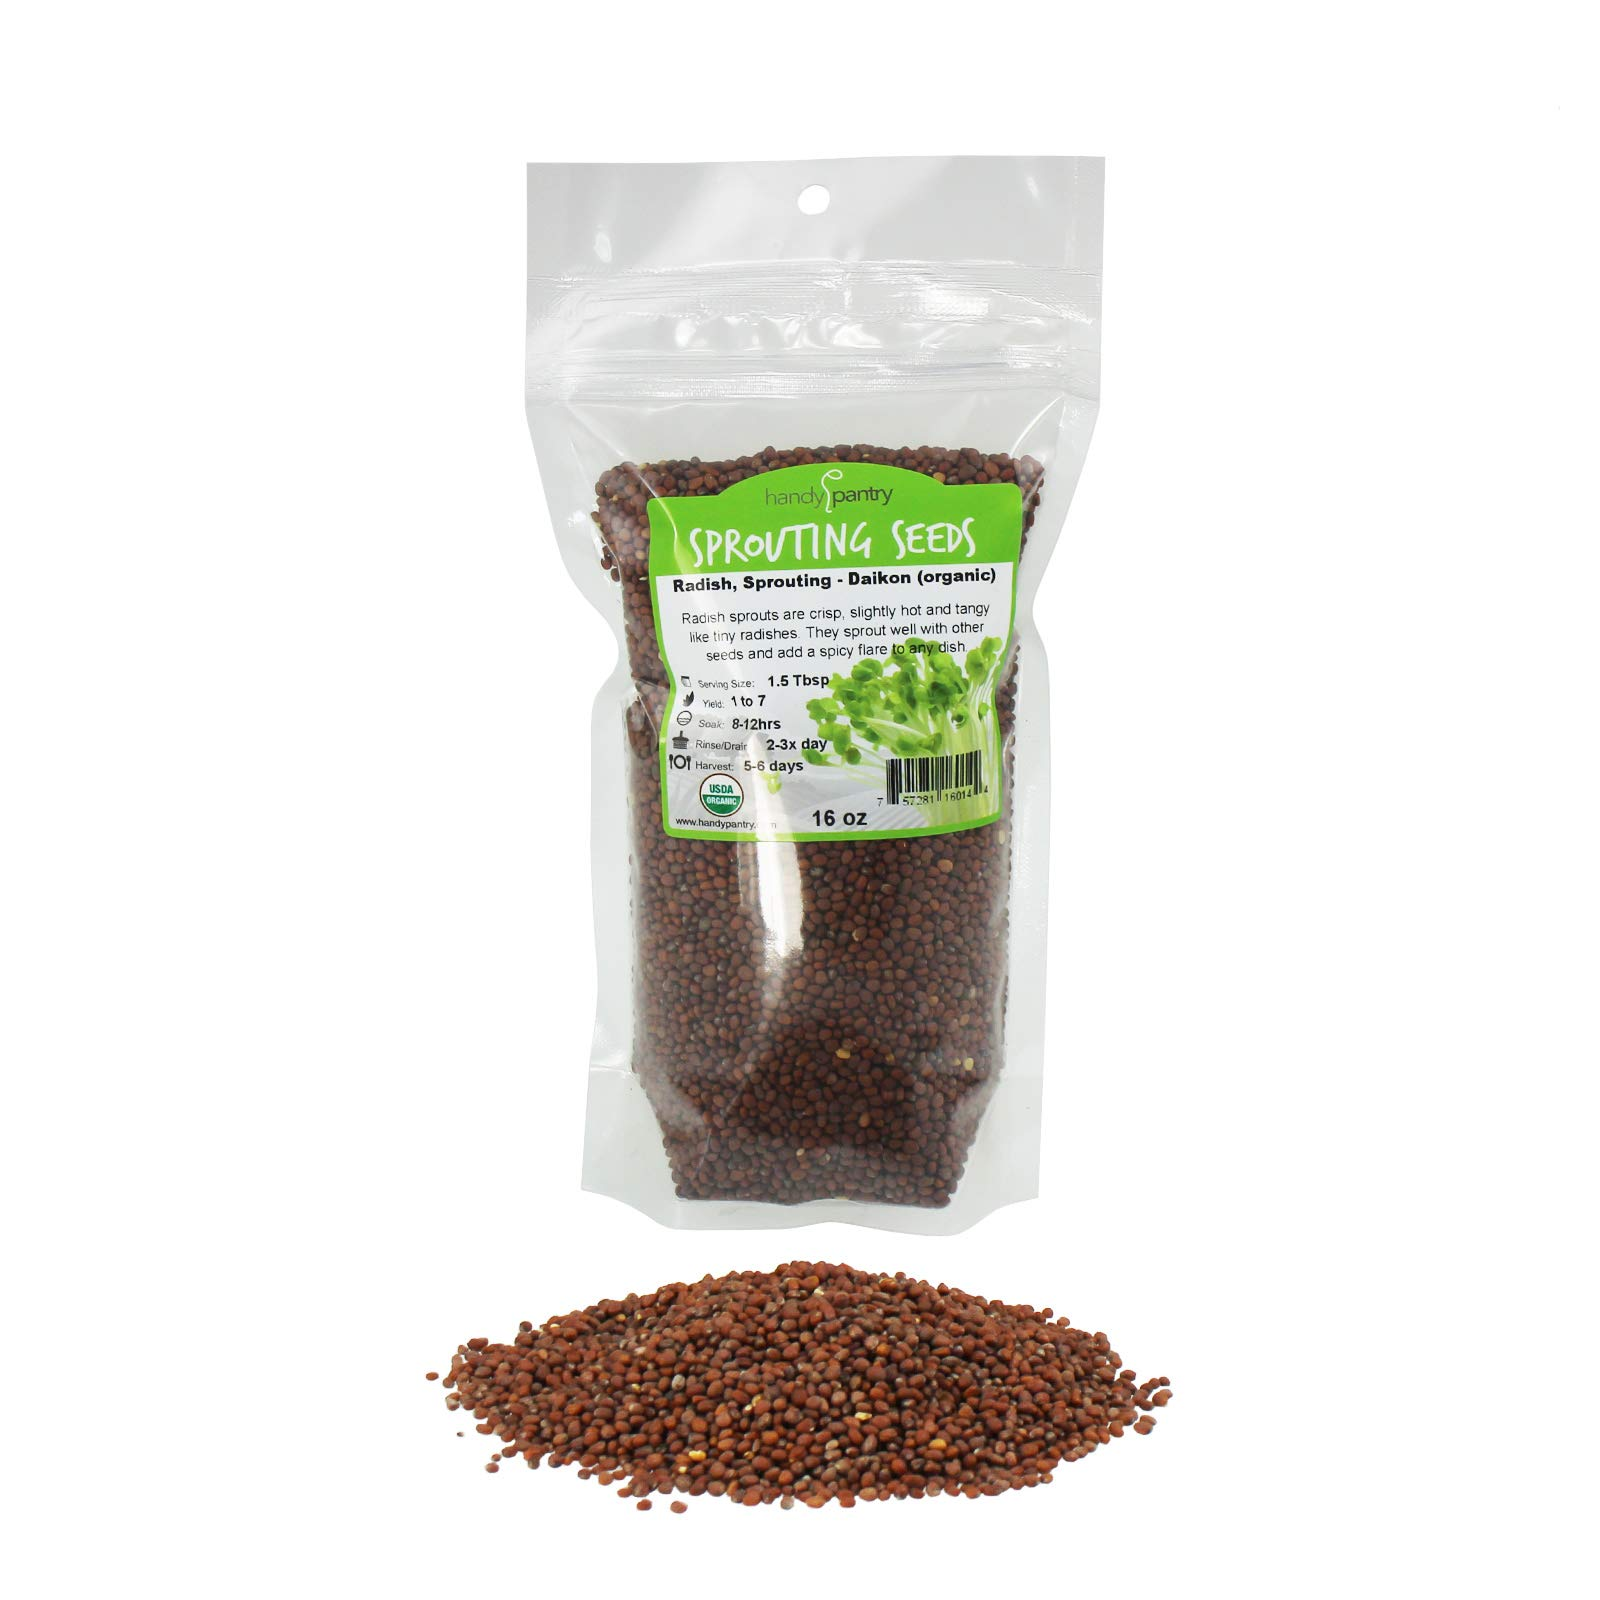 Organic Radish Sprouting Seeds | 1 Pound Non-GMO Daikon Radish Seeds by Handy Pantry